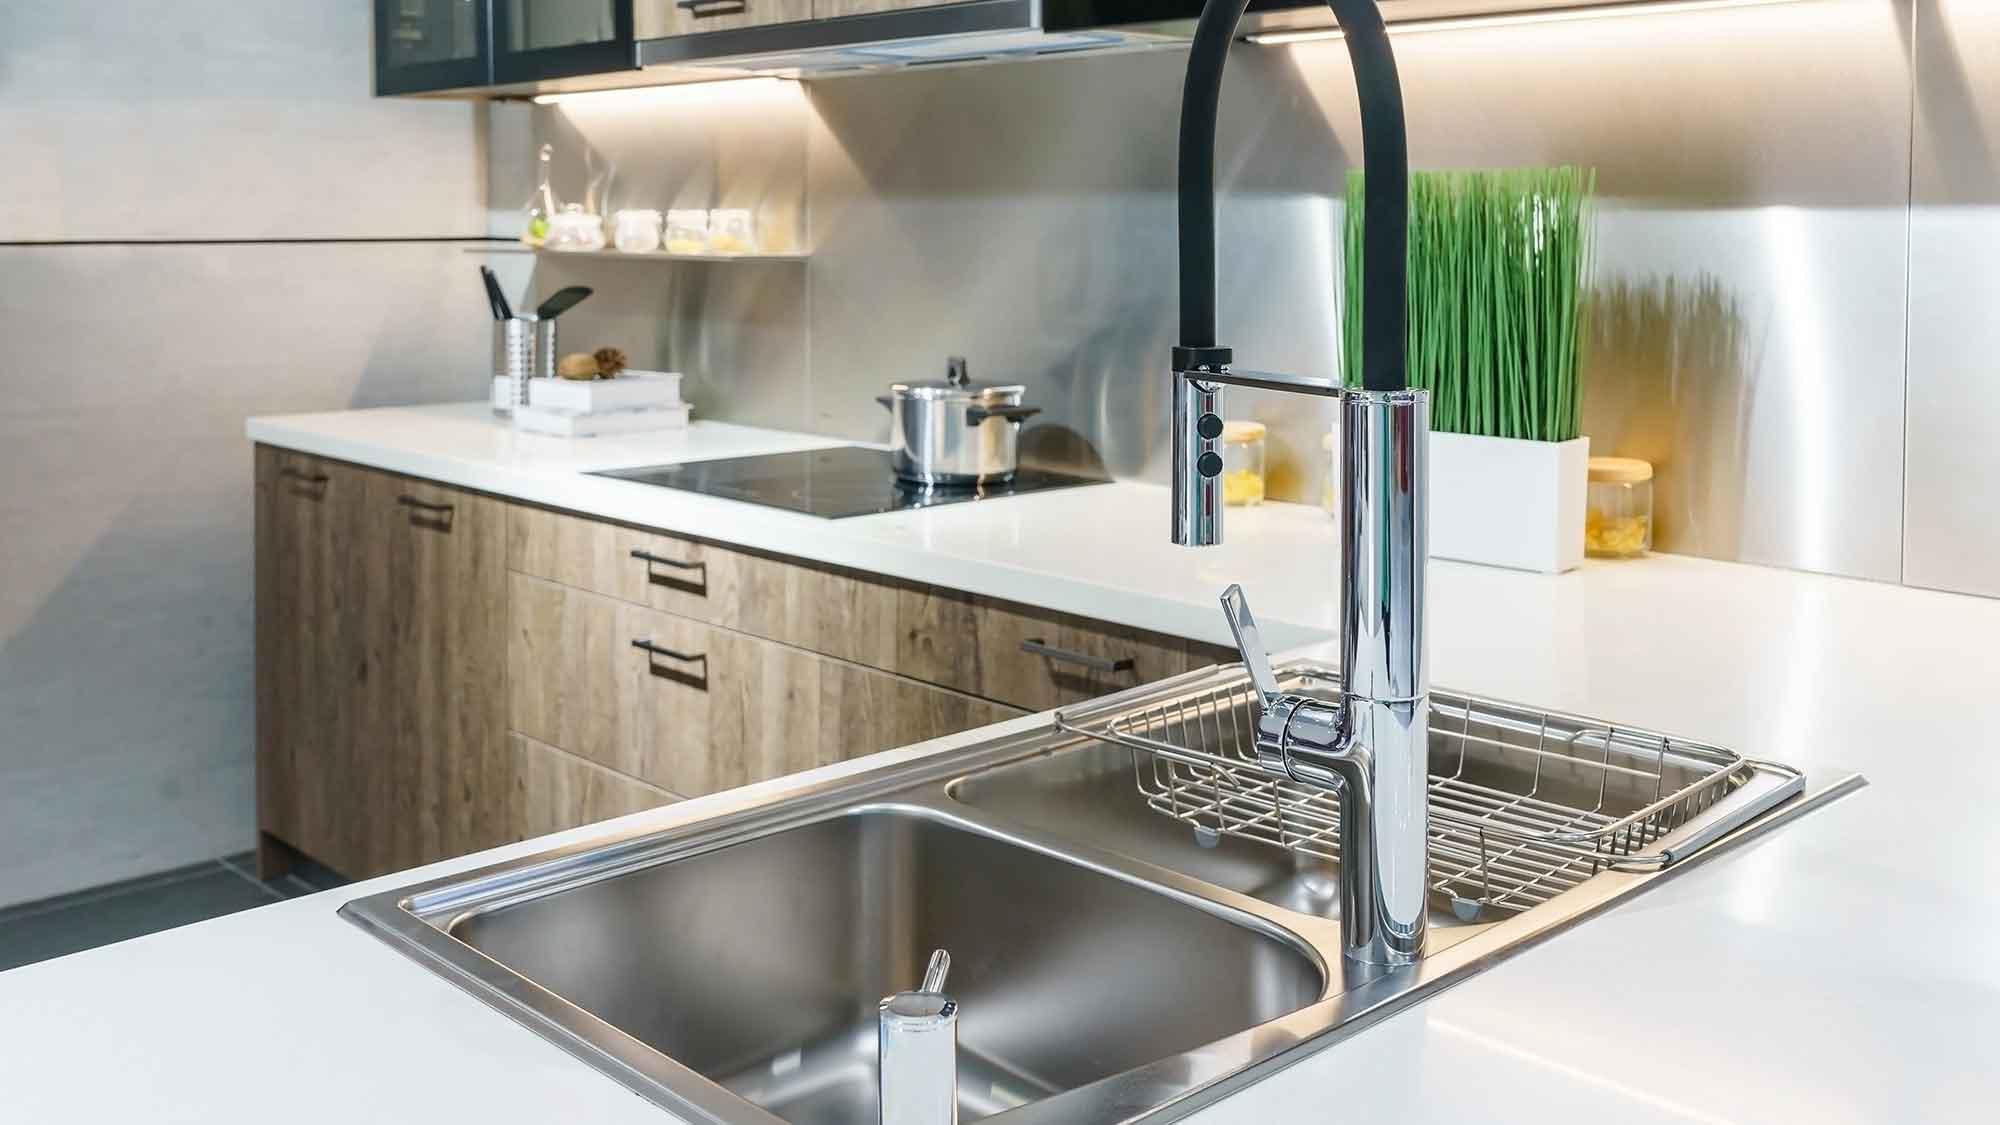 tap installations essex maintenance leigh on sea kitchen